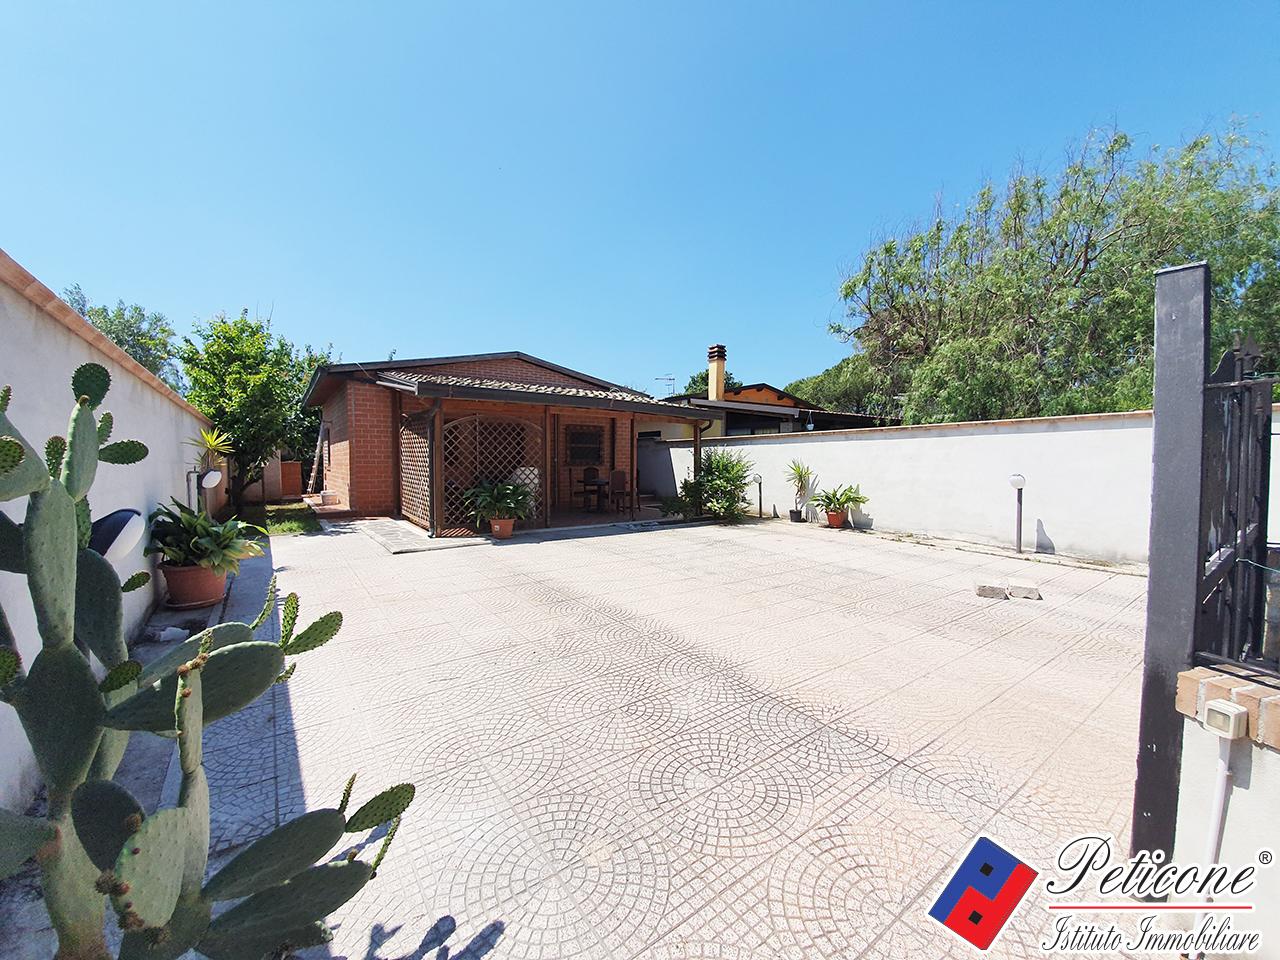 Villa in Vendita a Fondi: 4 locali, 50 mq - Foto 14